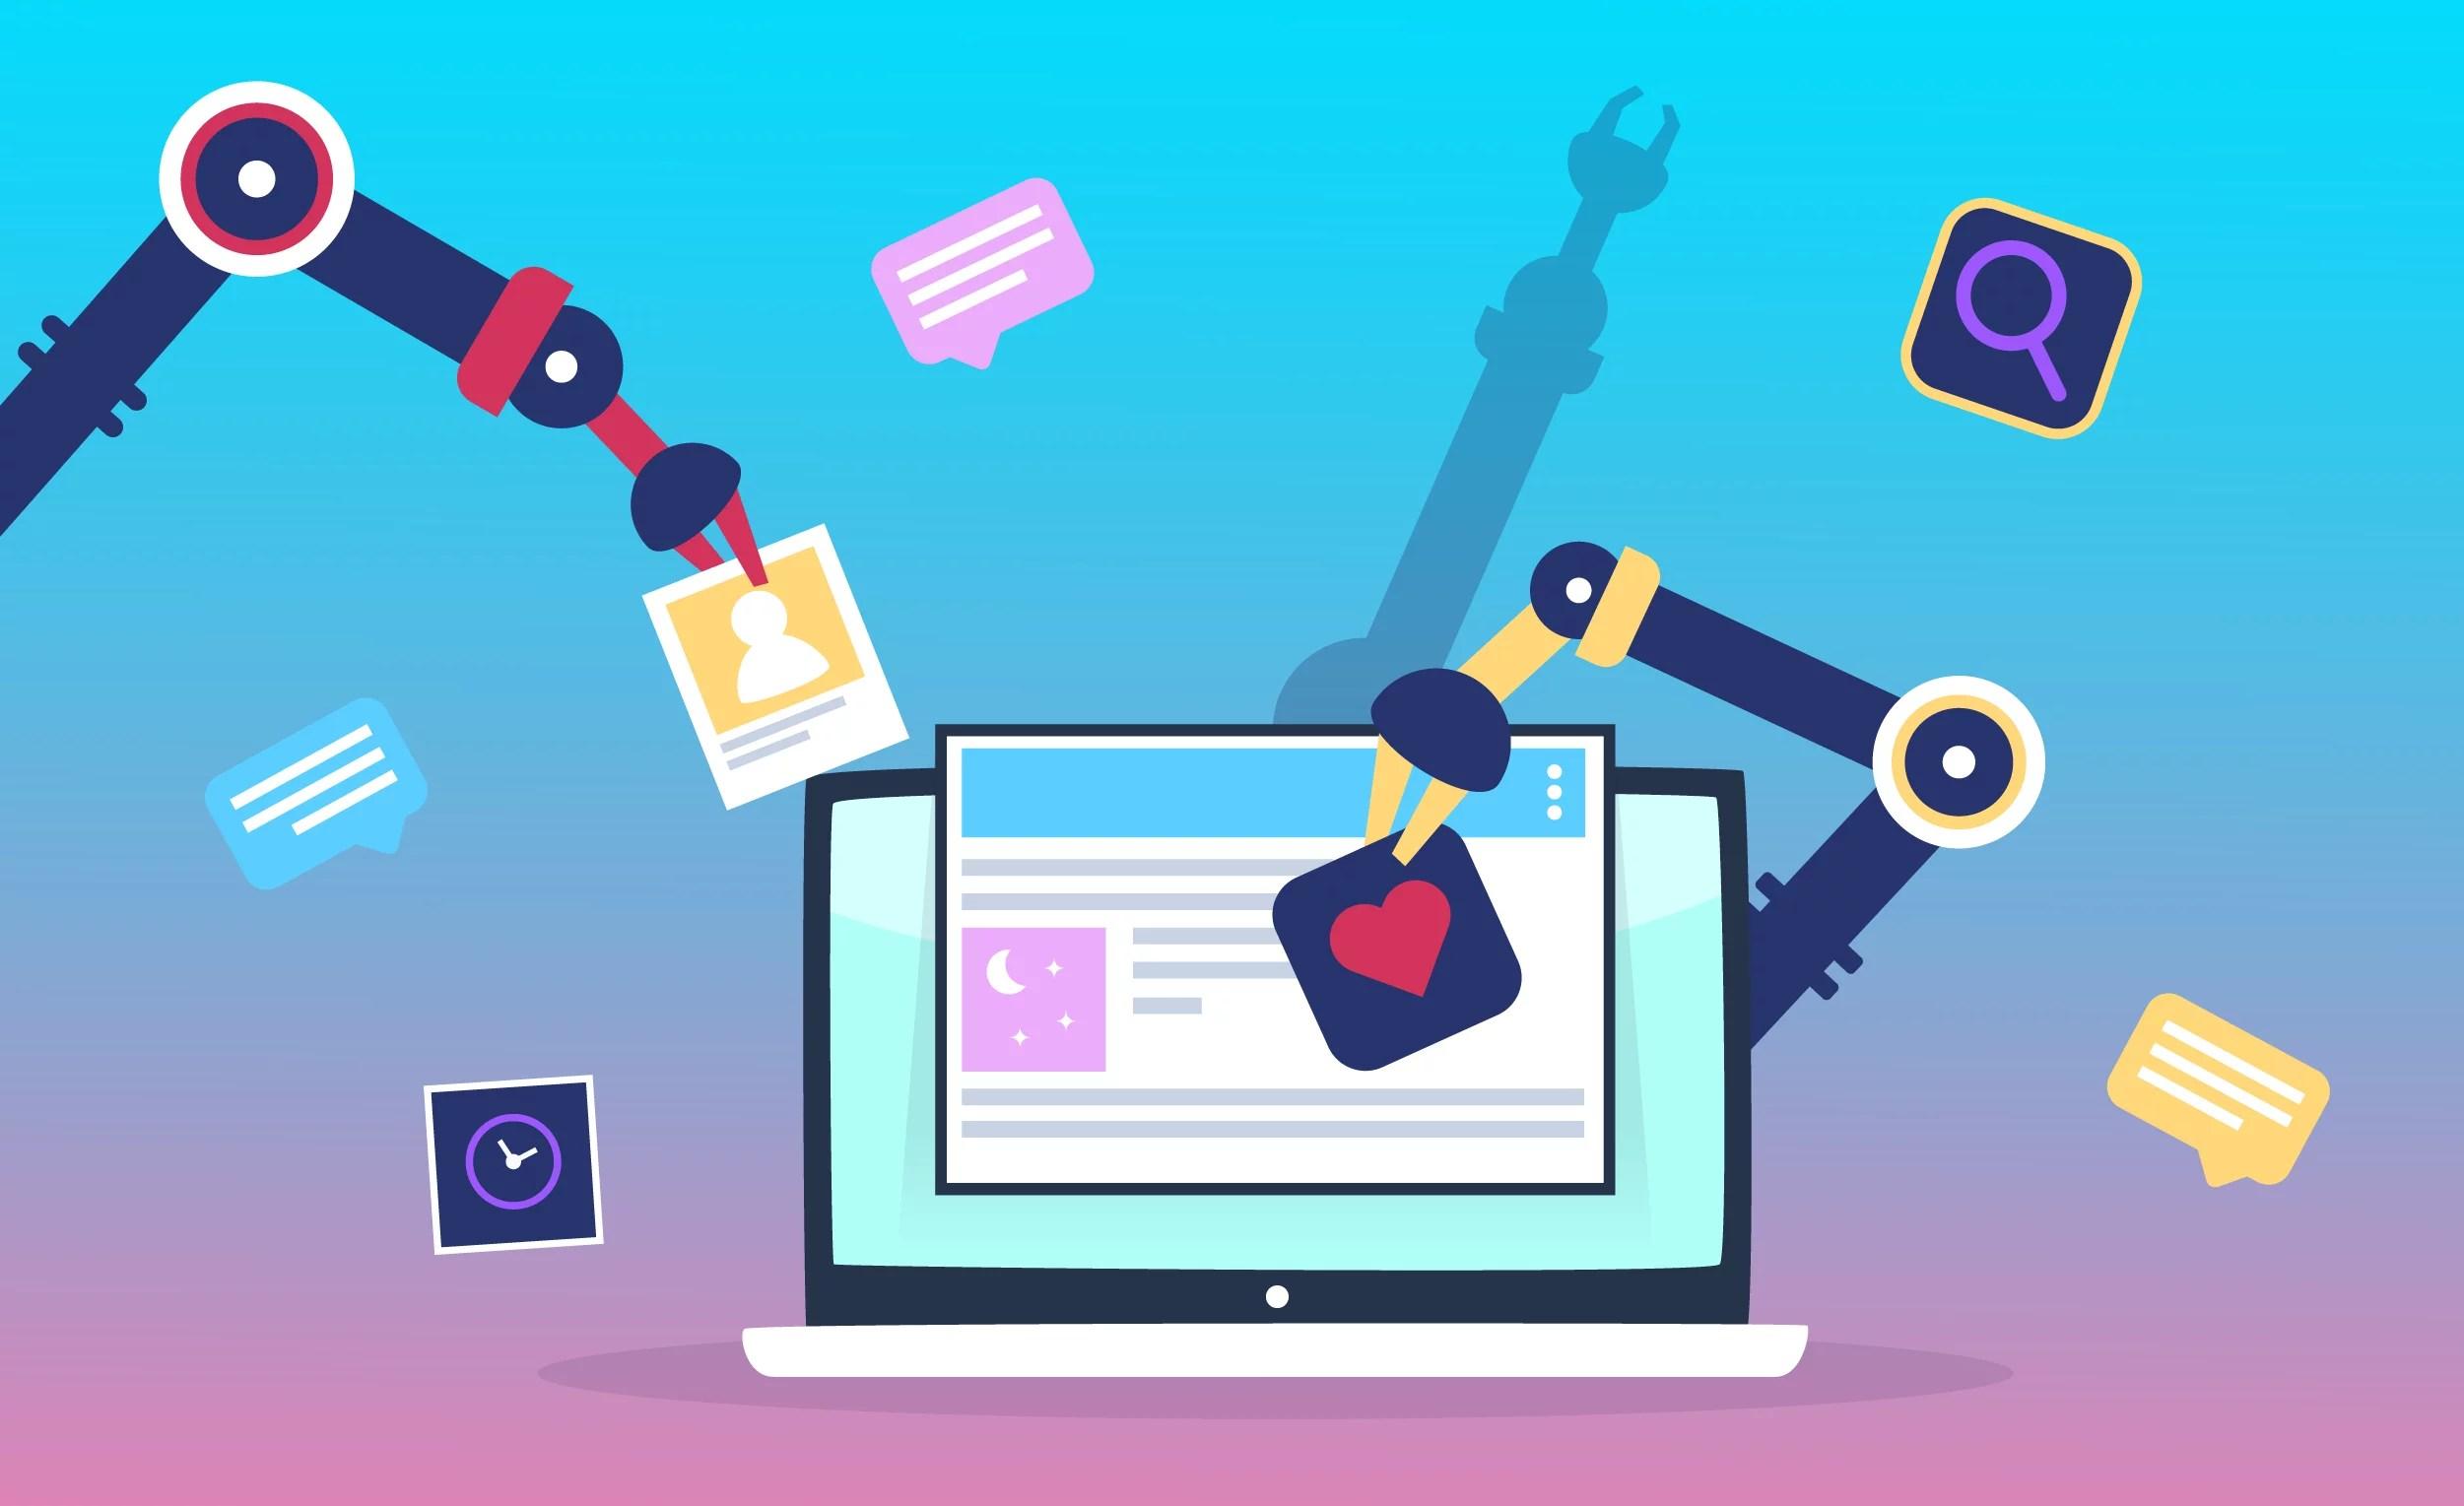 How to Create a Marketing Automation Platform Using Zapier